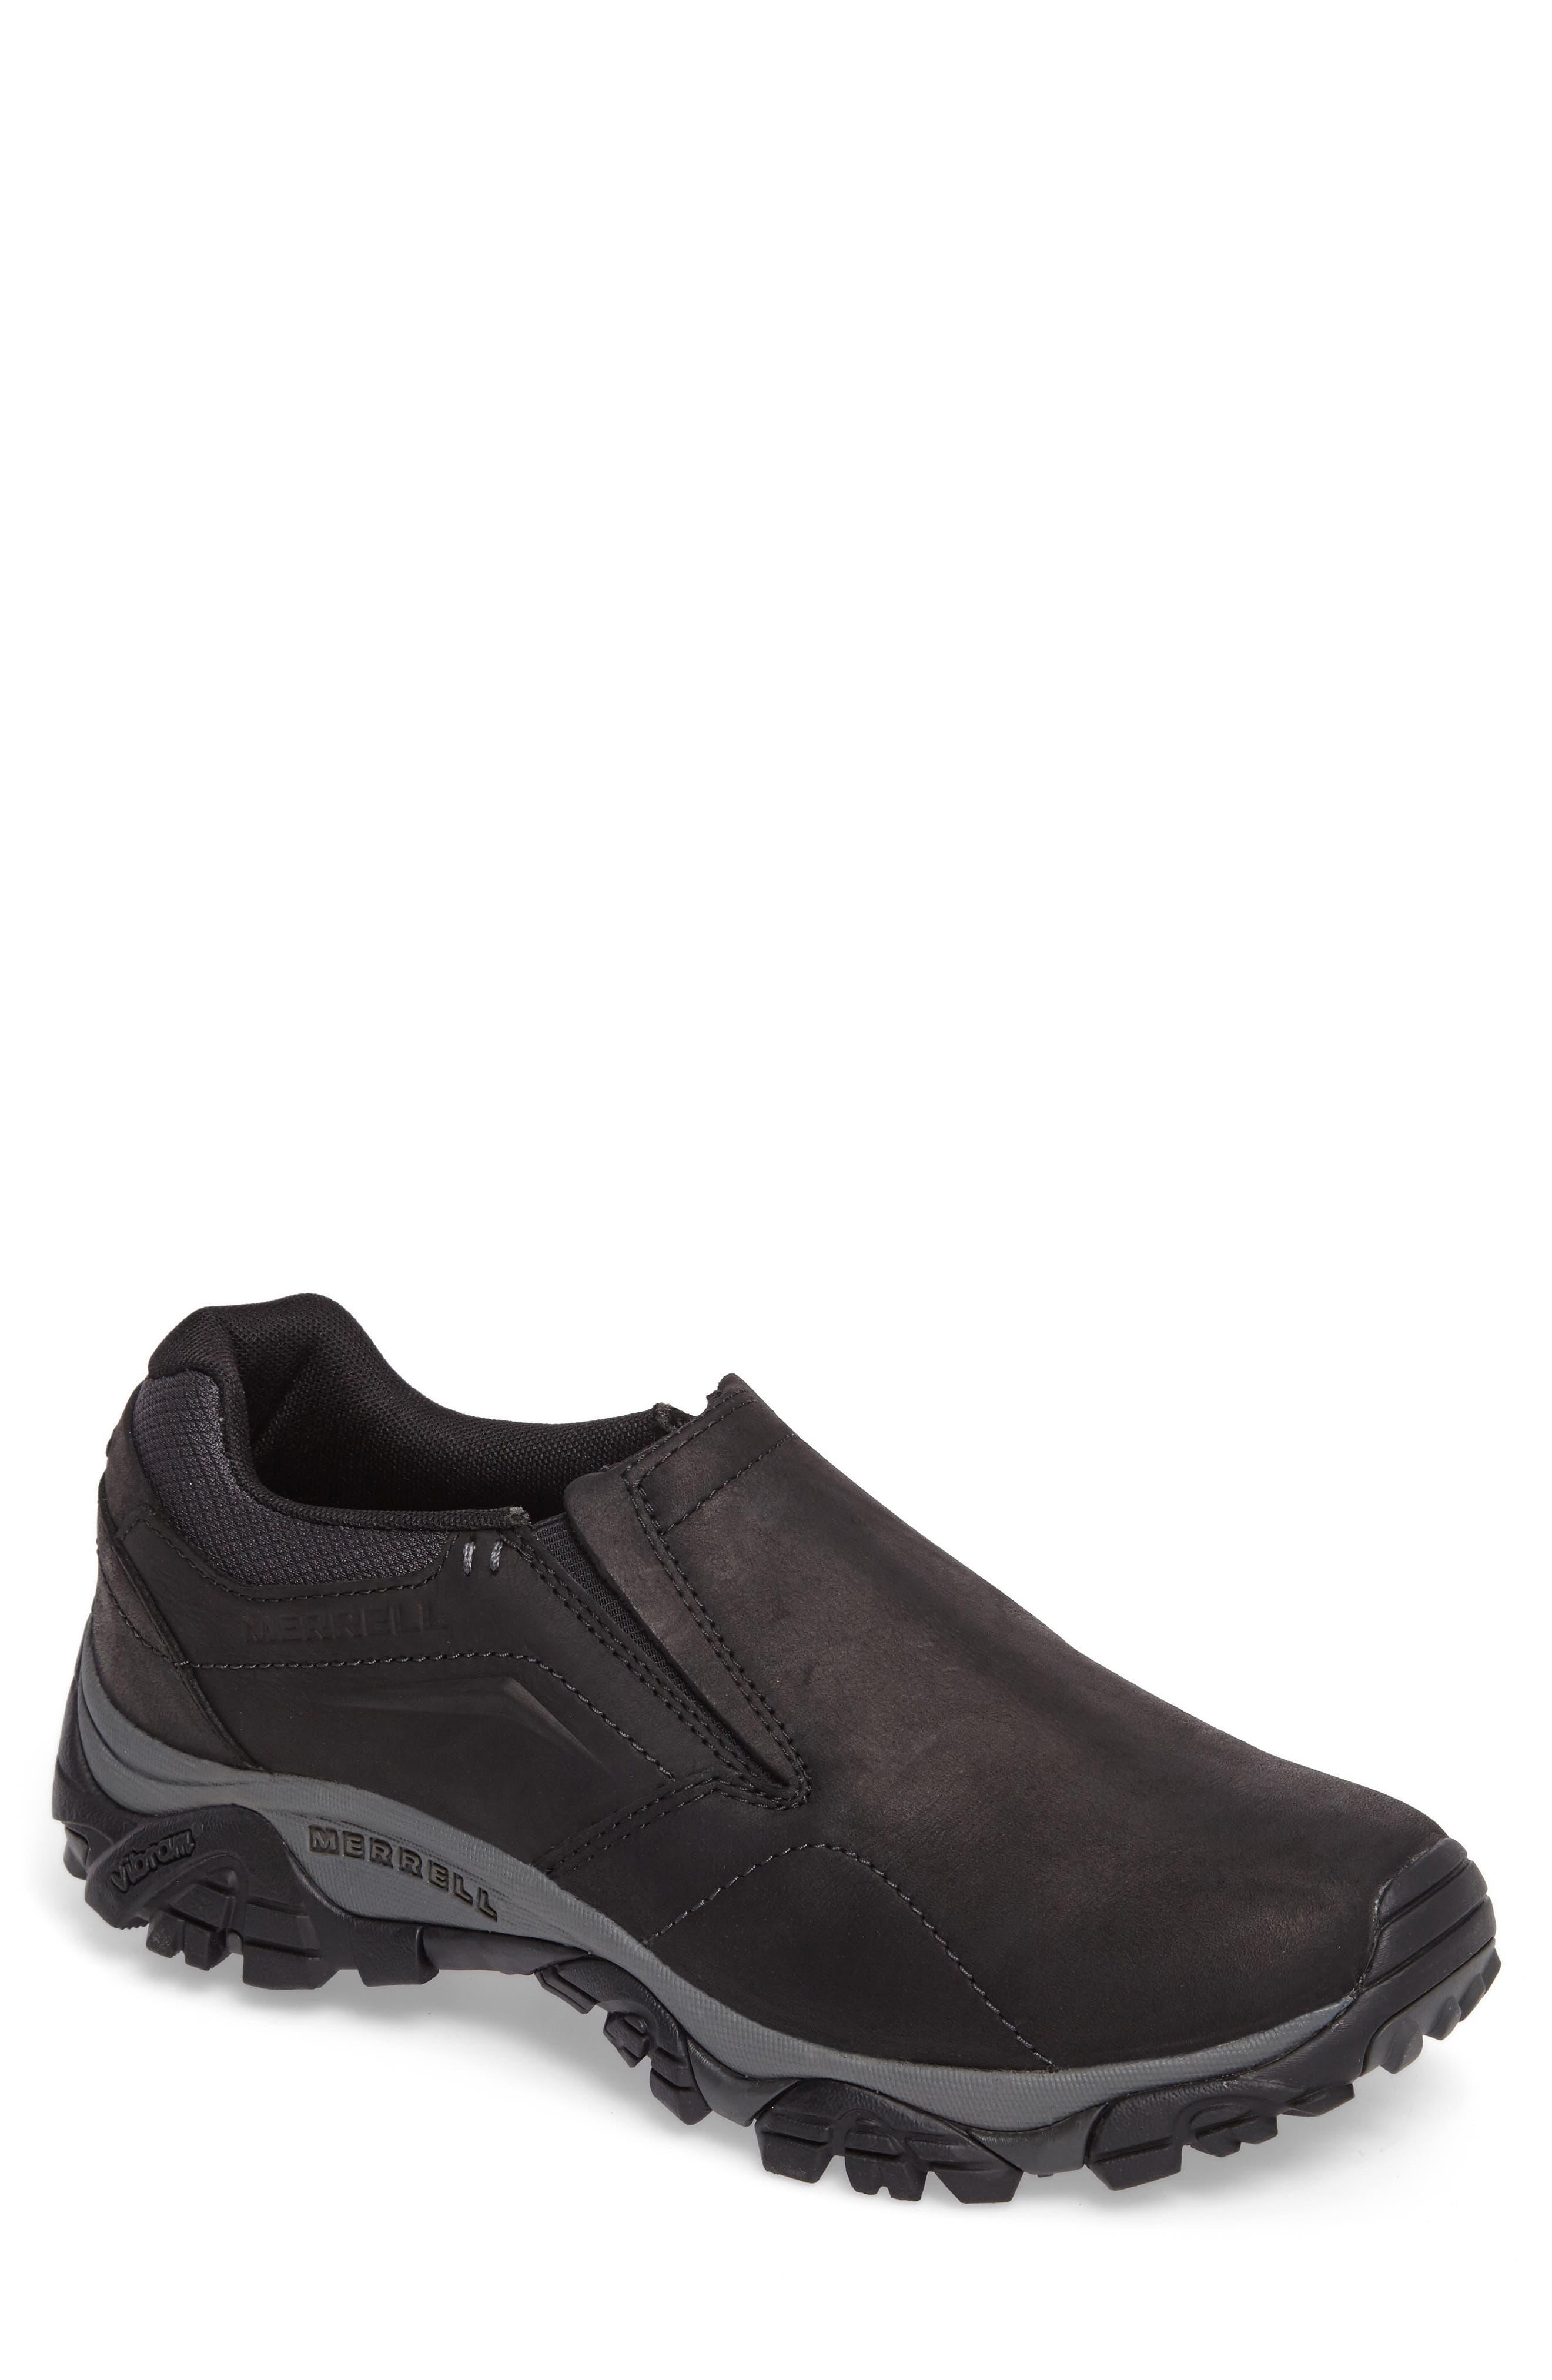 Alternate Image 1 Selected - Merrell Moab Adventure Hiking Shoe (Men)